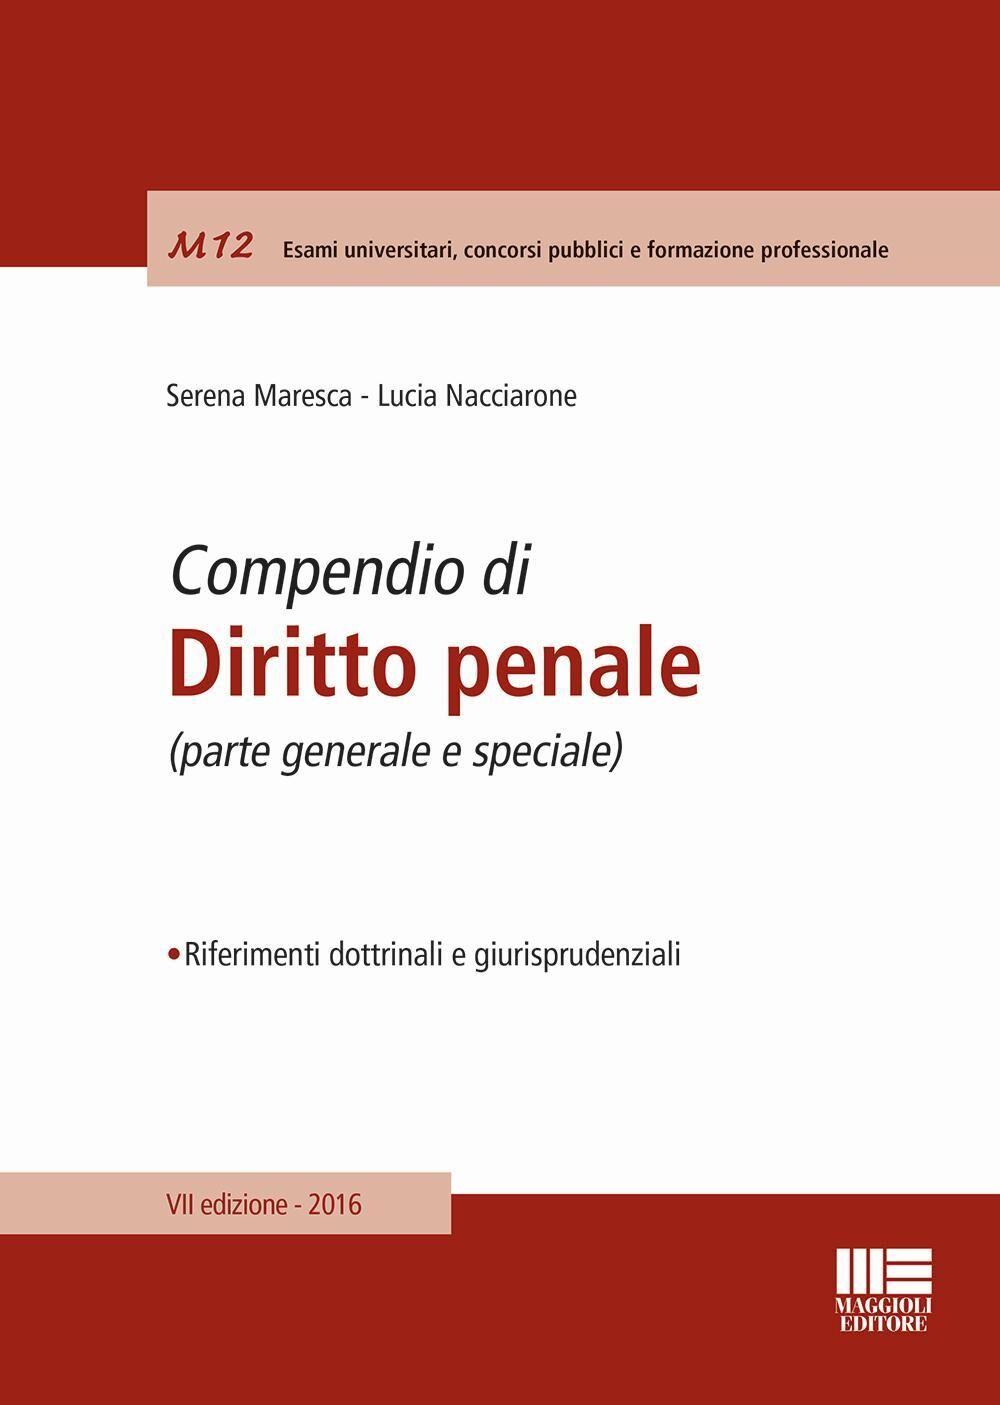 Appunti in PDF per l esame di Diritto Processuale Penale